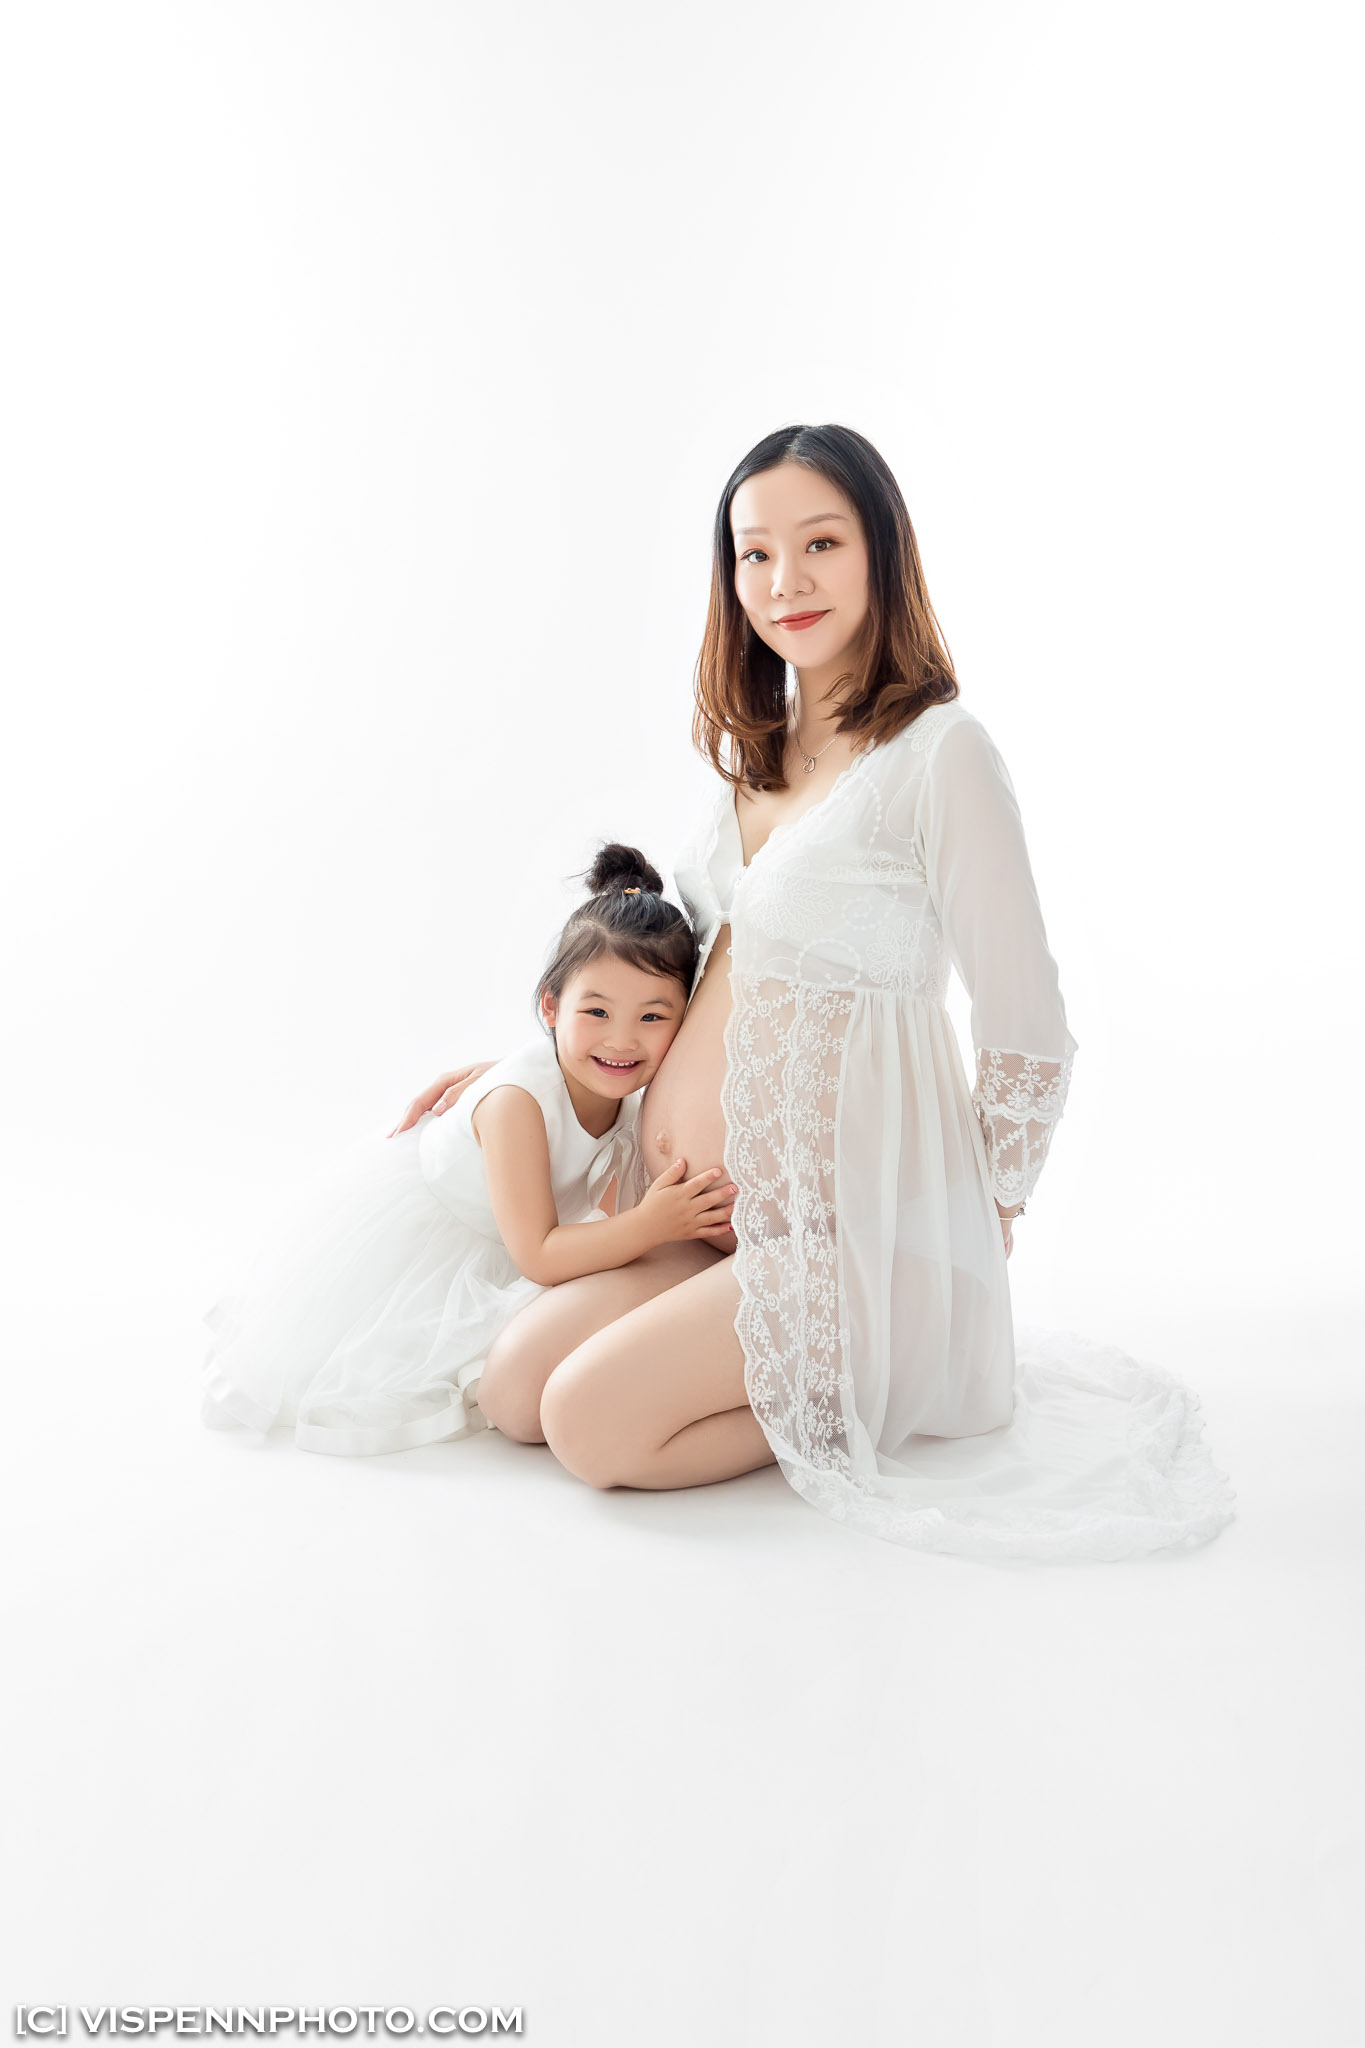 Melbourne Newborn Baby Maternity Family Photo VISPENN 墨尔本 孕妇照 大肚照 HeatherXUE 1477 VISPENN